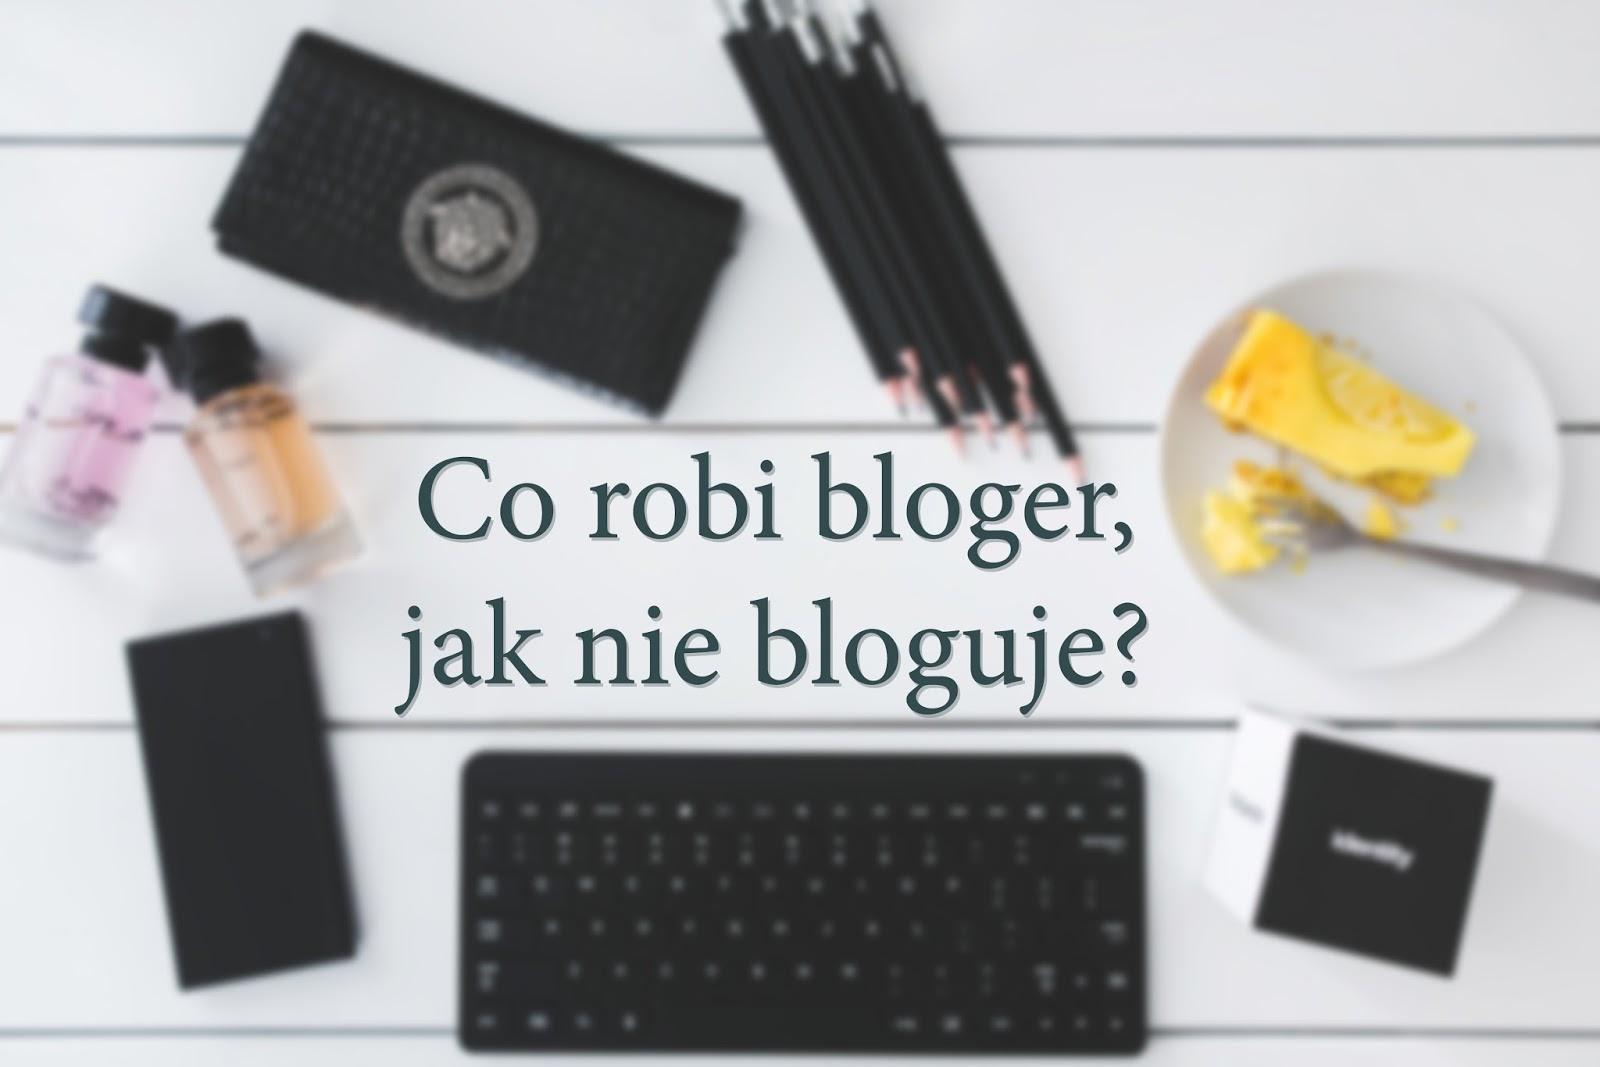 Co robi bloger, jak nie bloguje